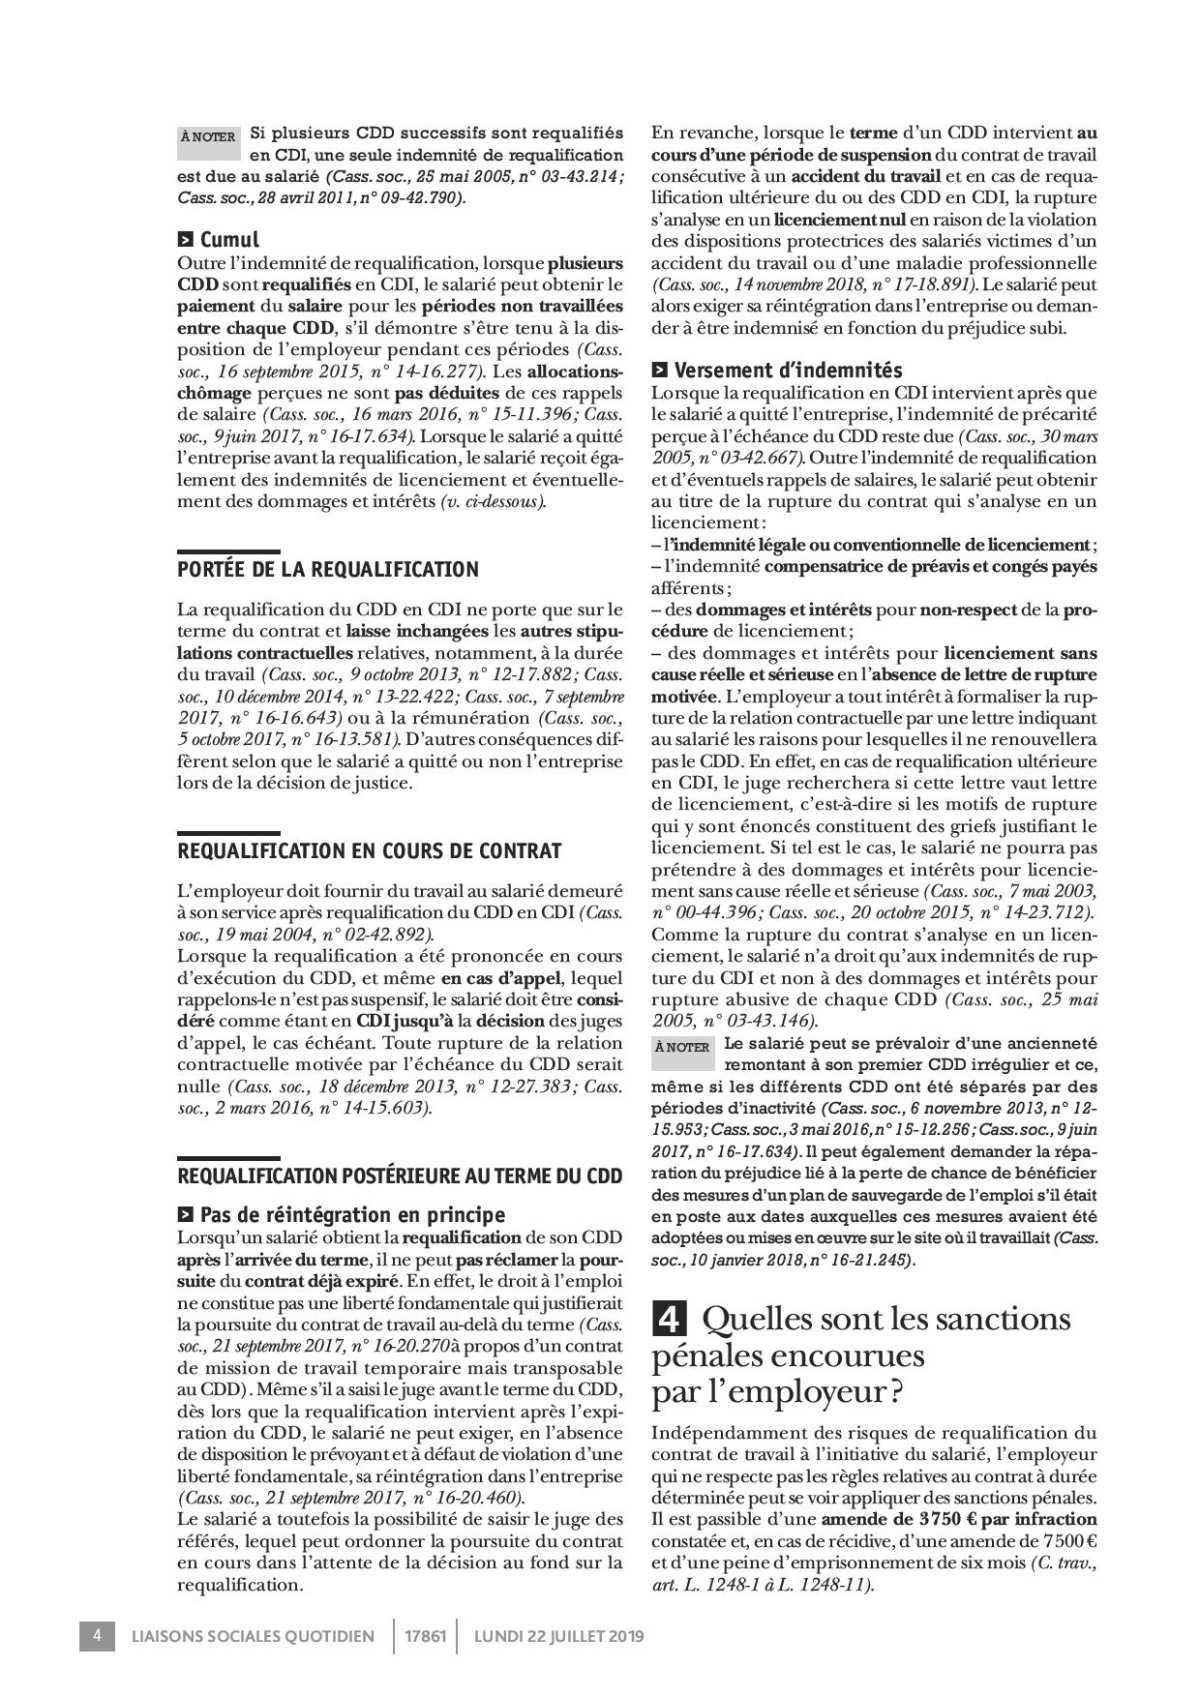 Requalification du CDD en CDI